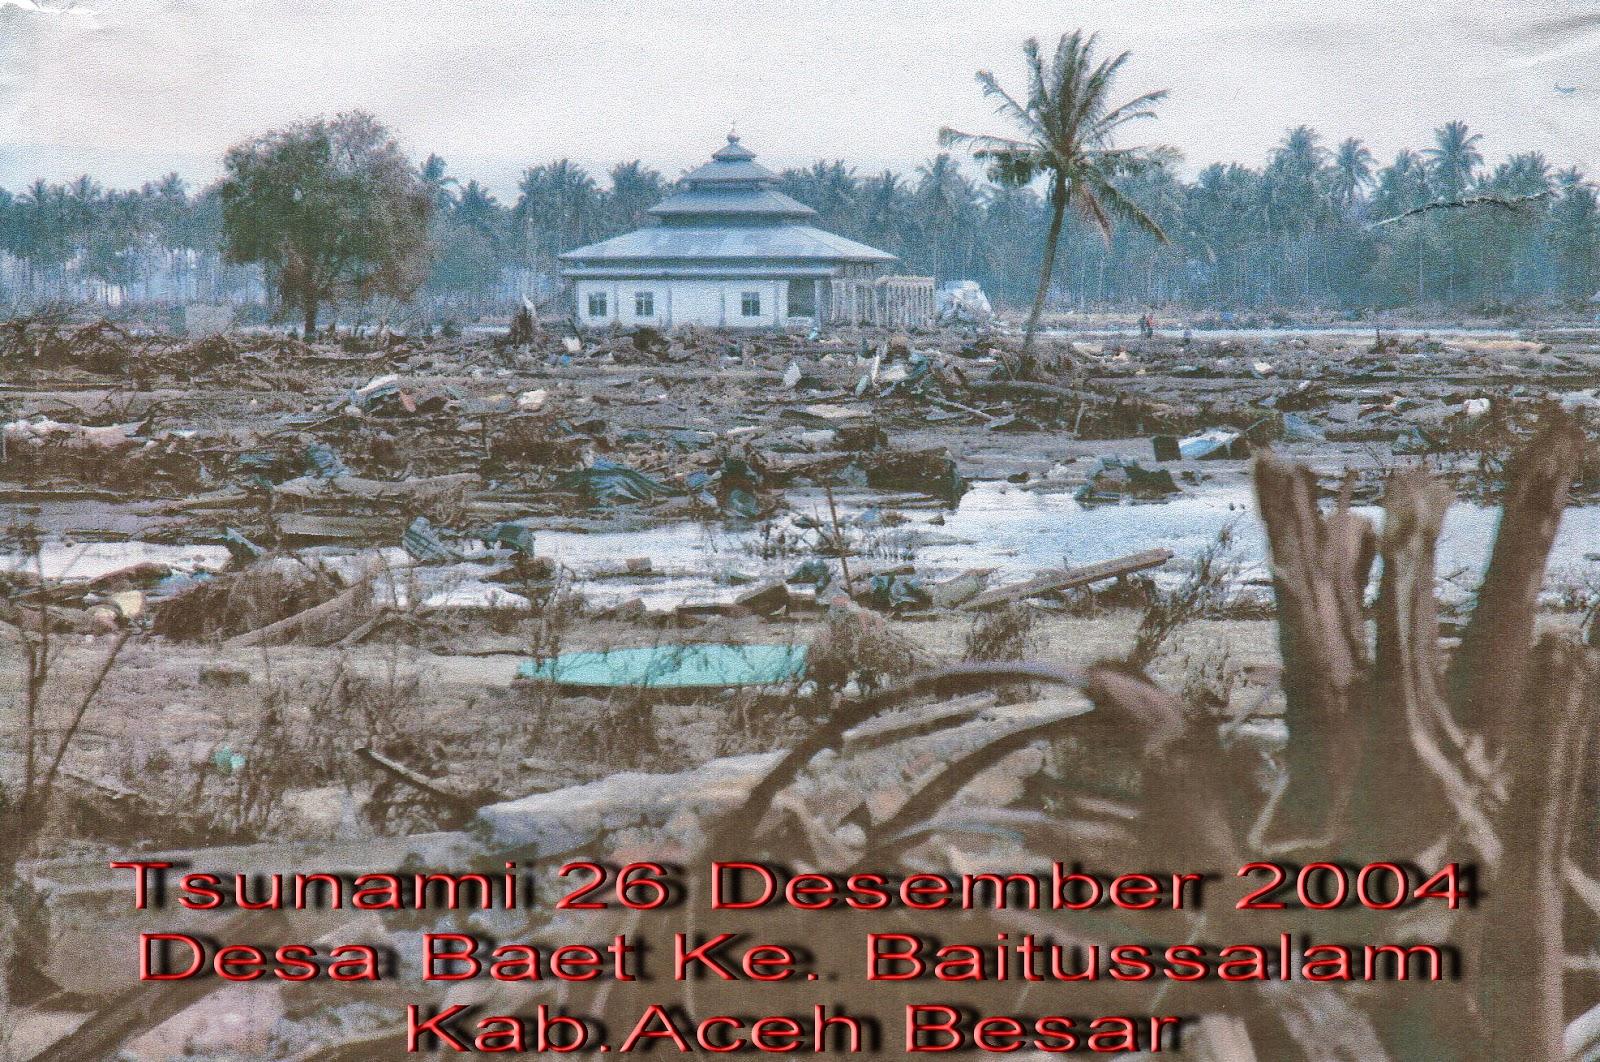 Tsunami 26 Desember 2004 Desa Baet